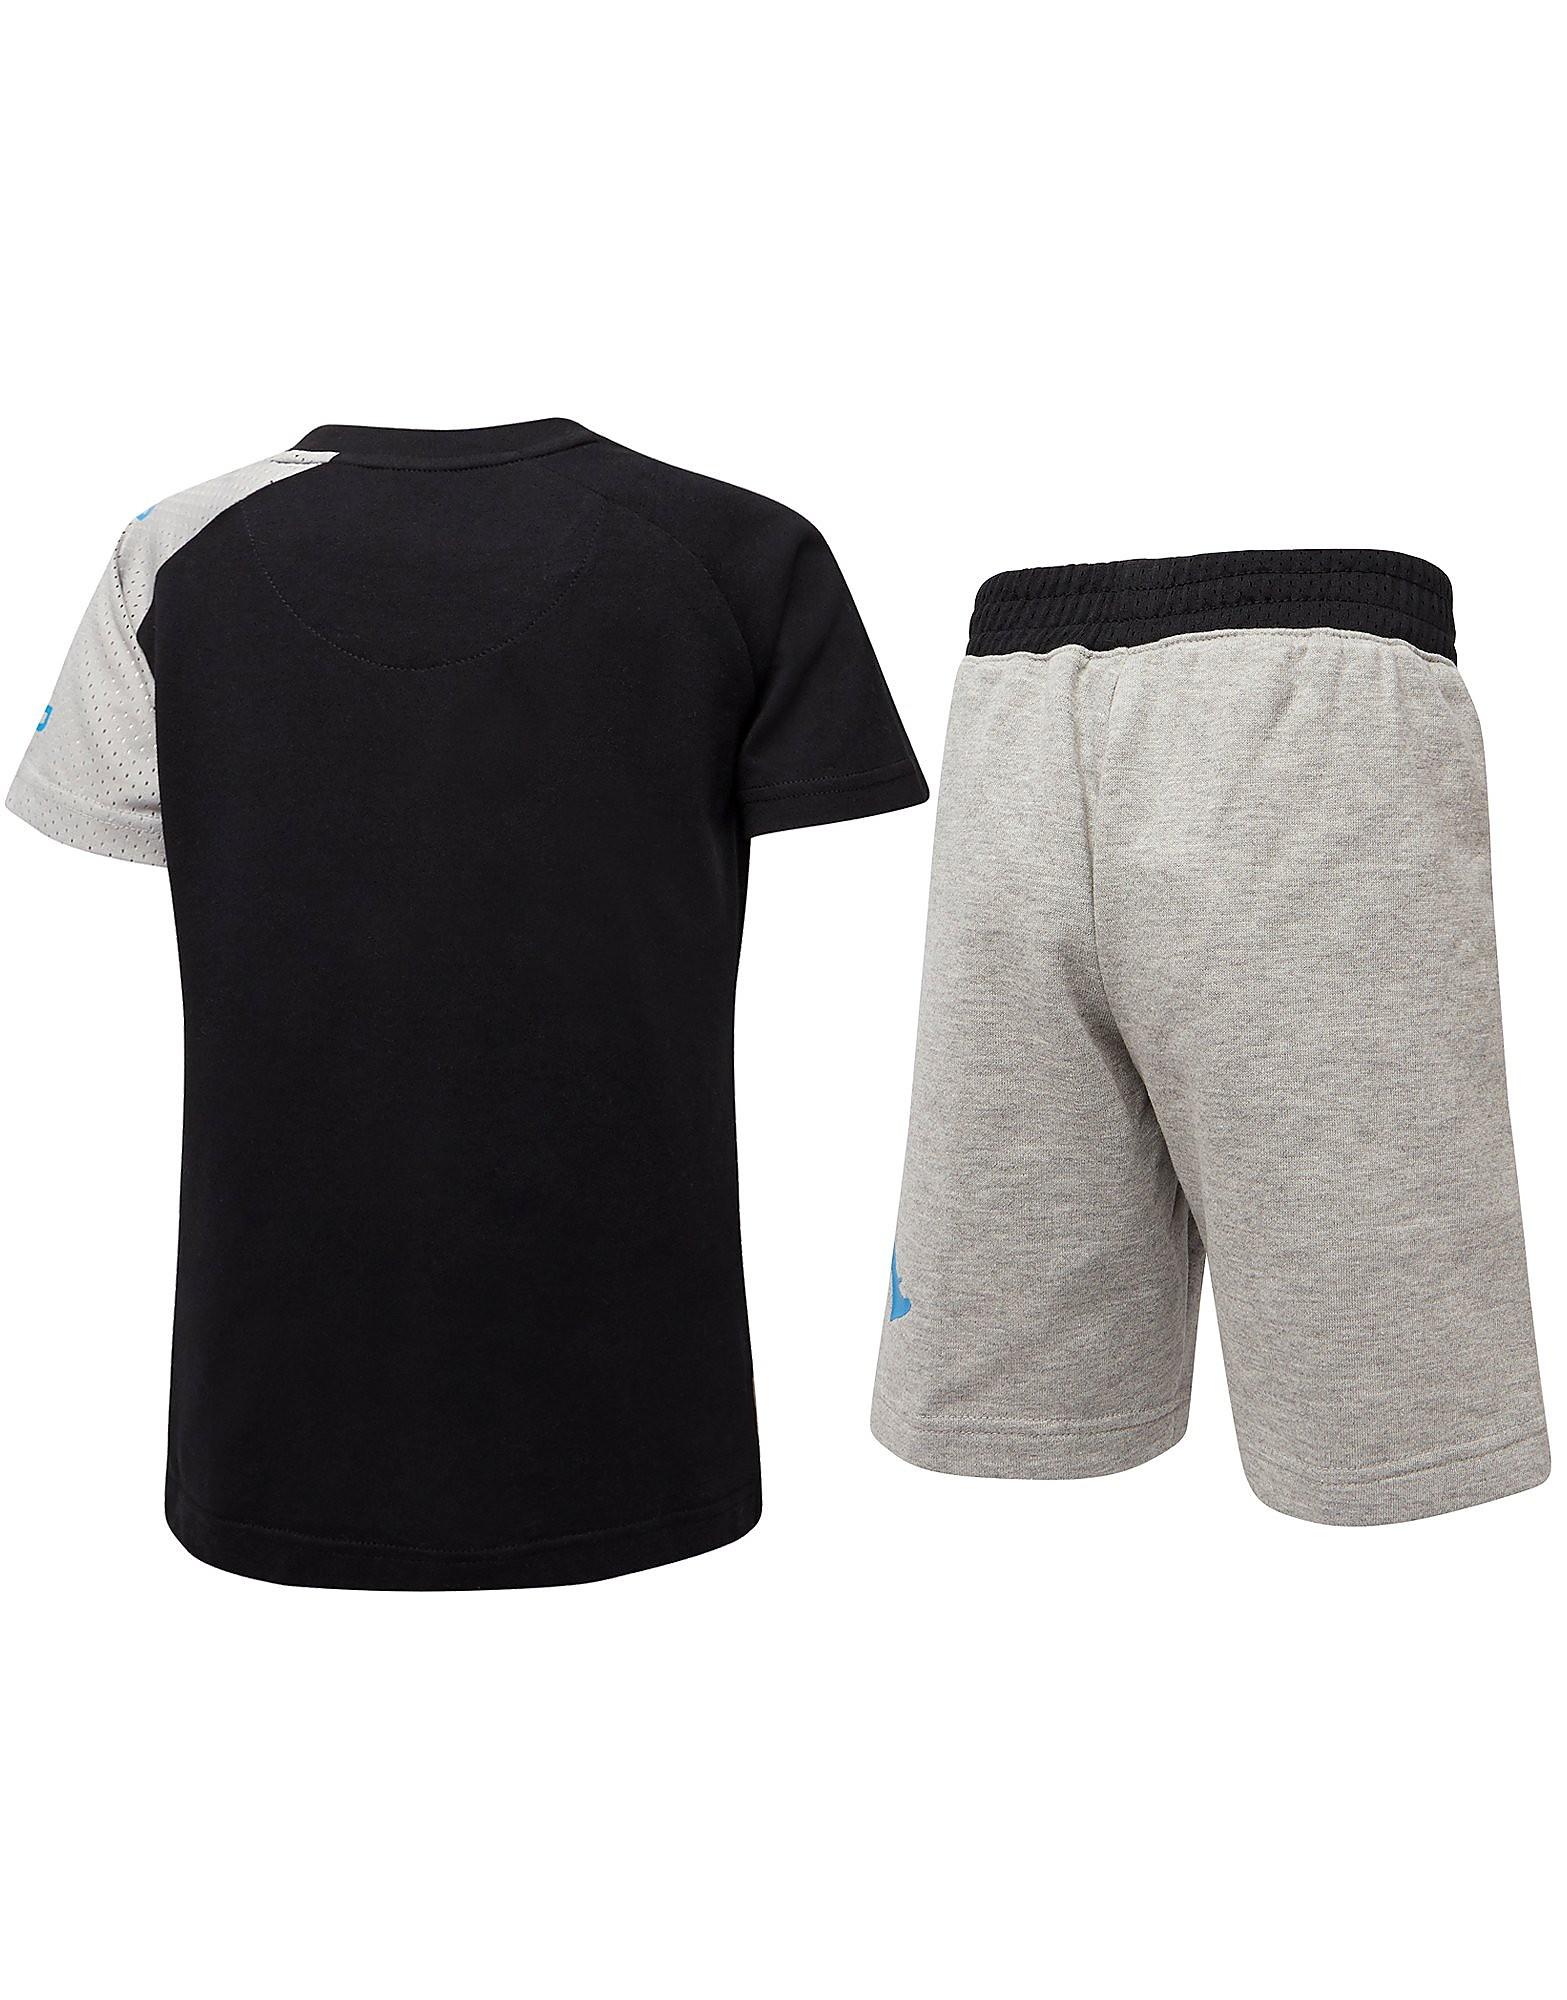 Jordan Air Completo T-Sirt & Shorts Bambino